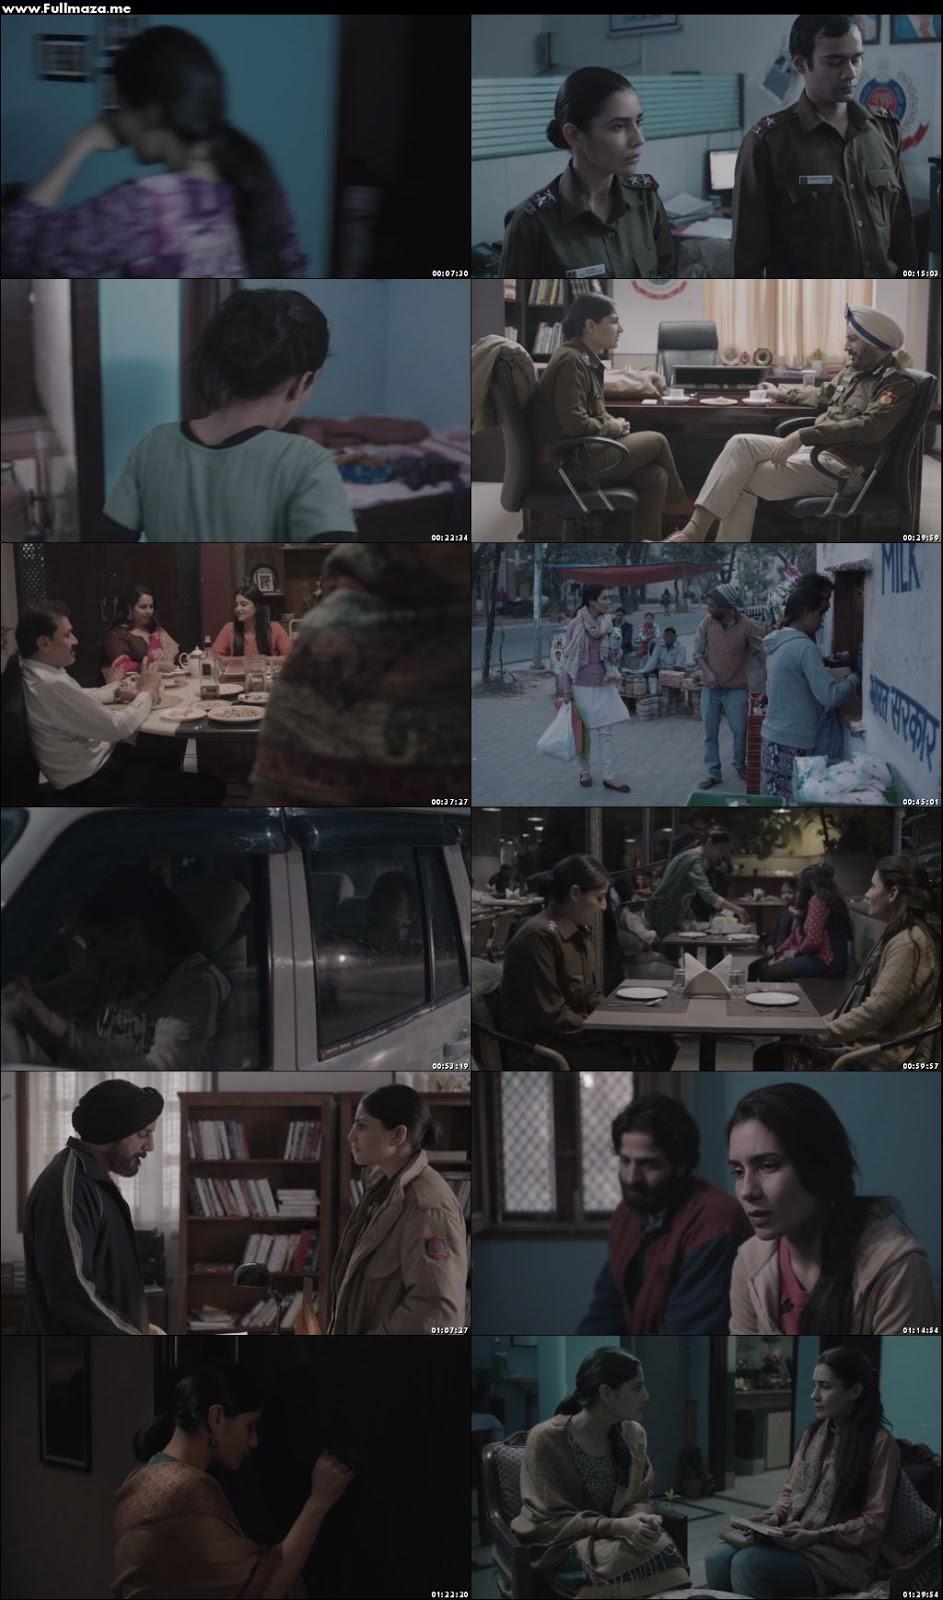 New Hindi Movei 2018 2019 Bolliwood: Soni 2019 Hindi Movie 480p HDRip